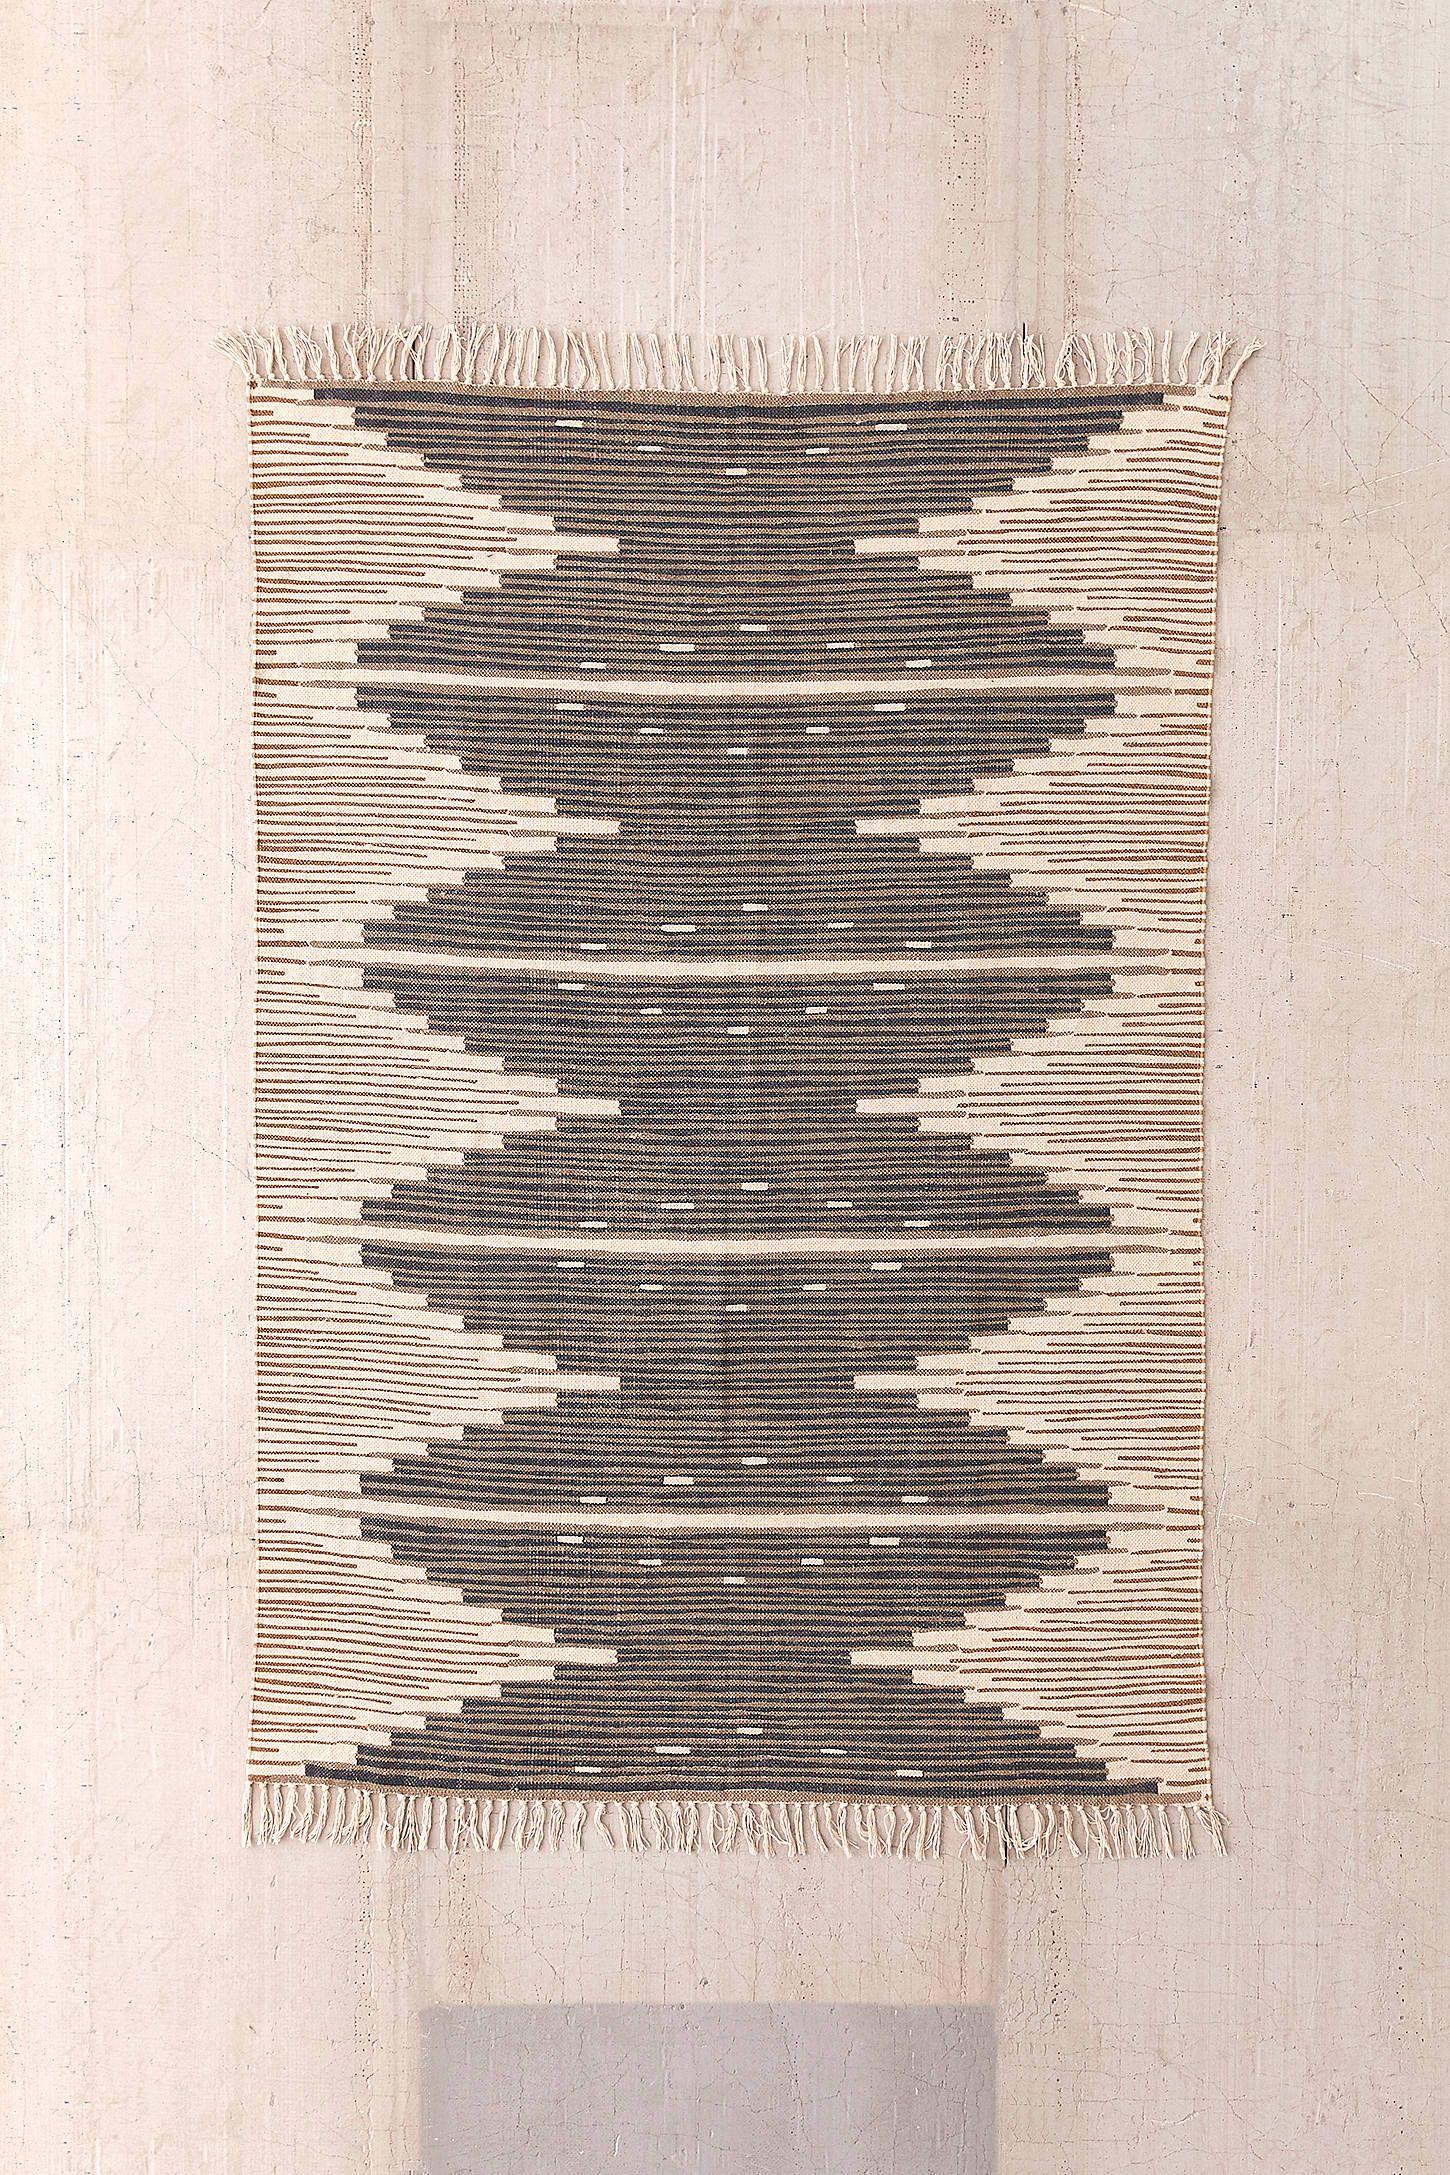 Lazro Printed Rug Rugs Cotton Area Rug Printed Rugs